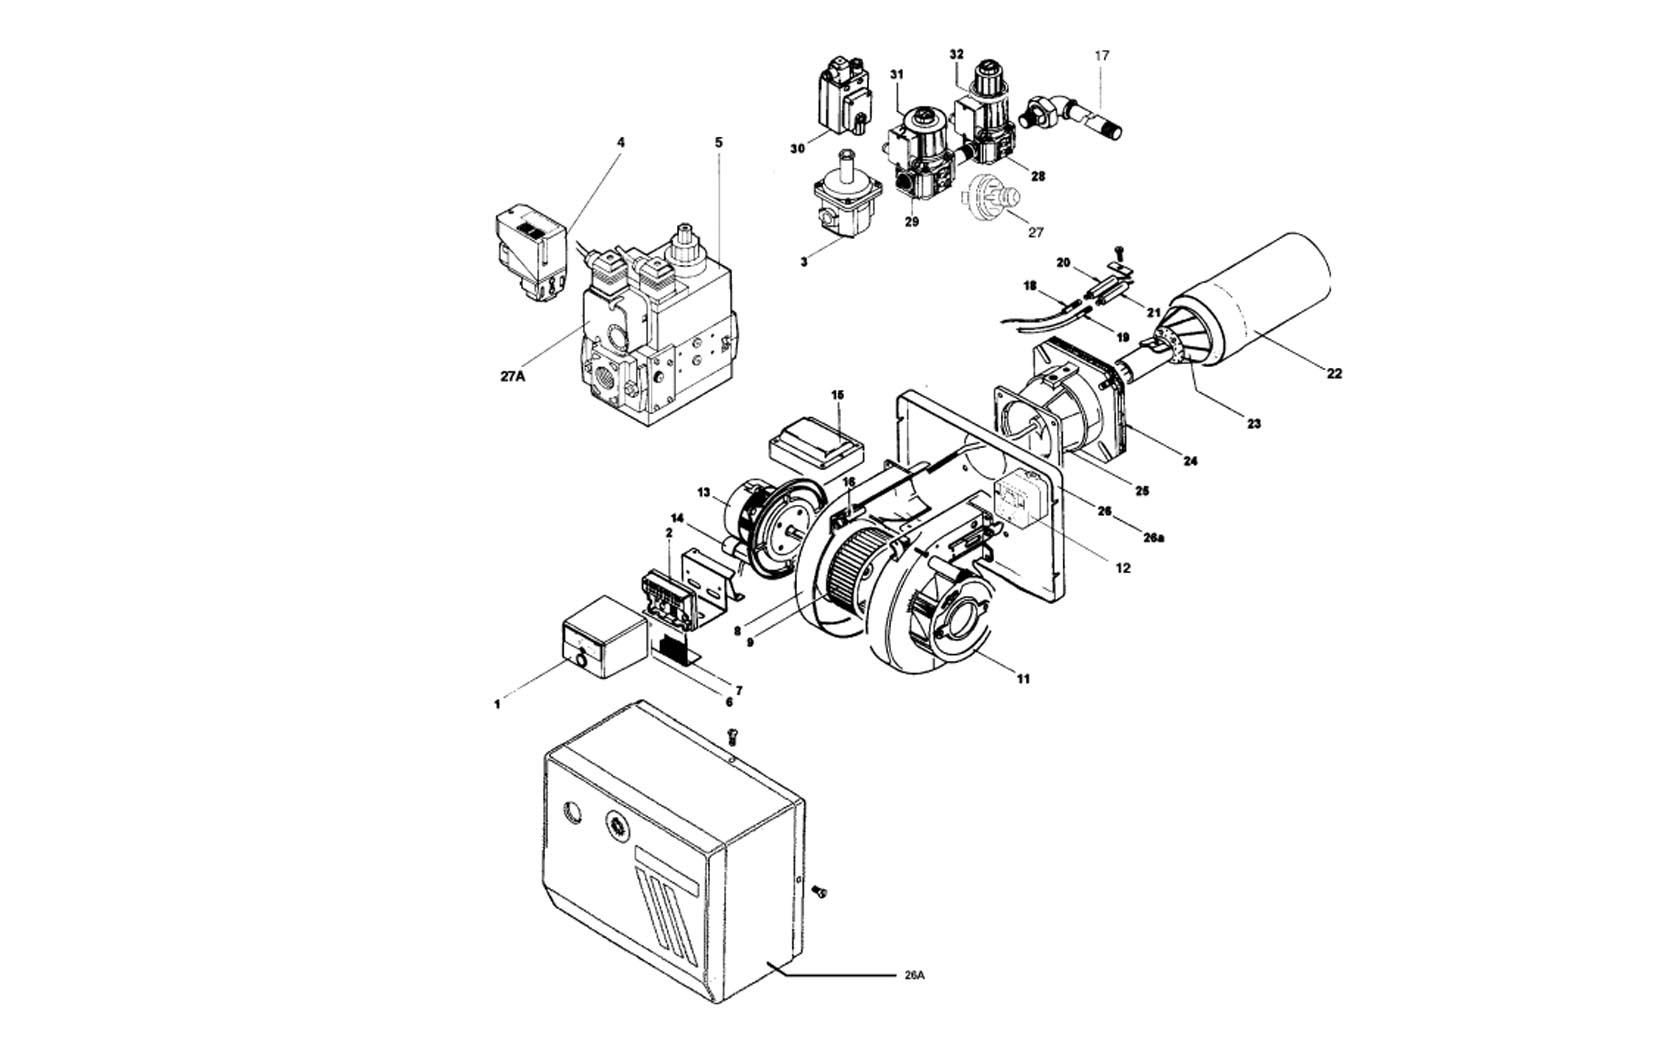 CIB Unigas Miniflam Tecnopan S10